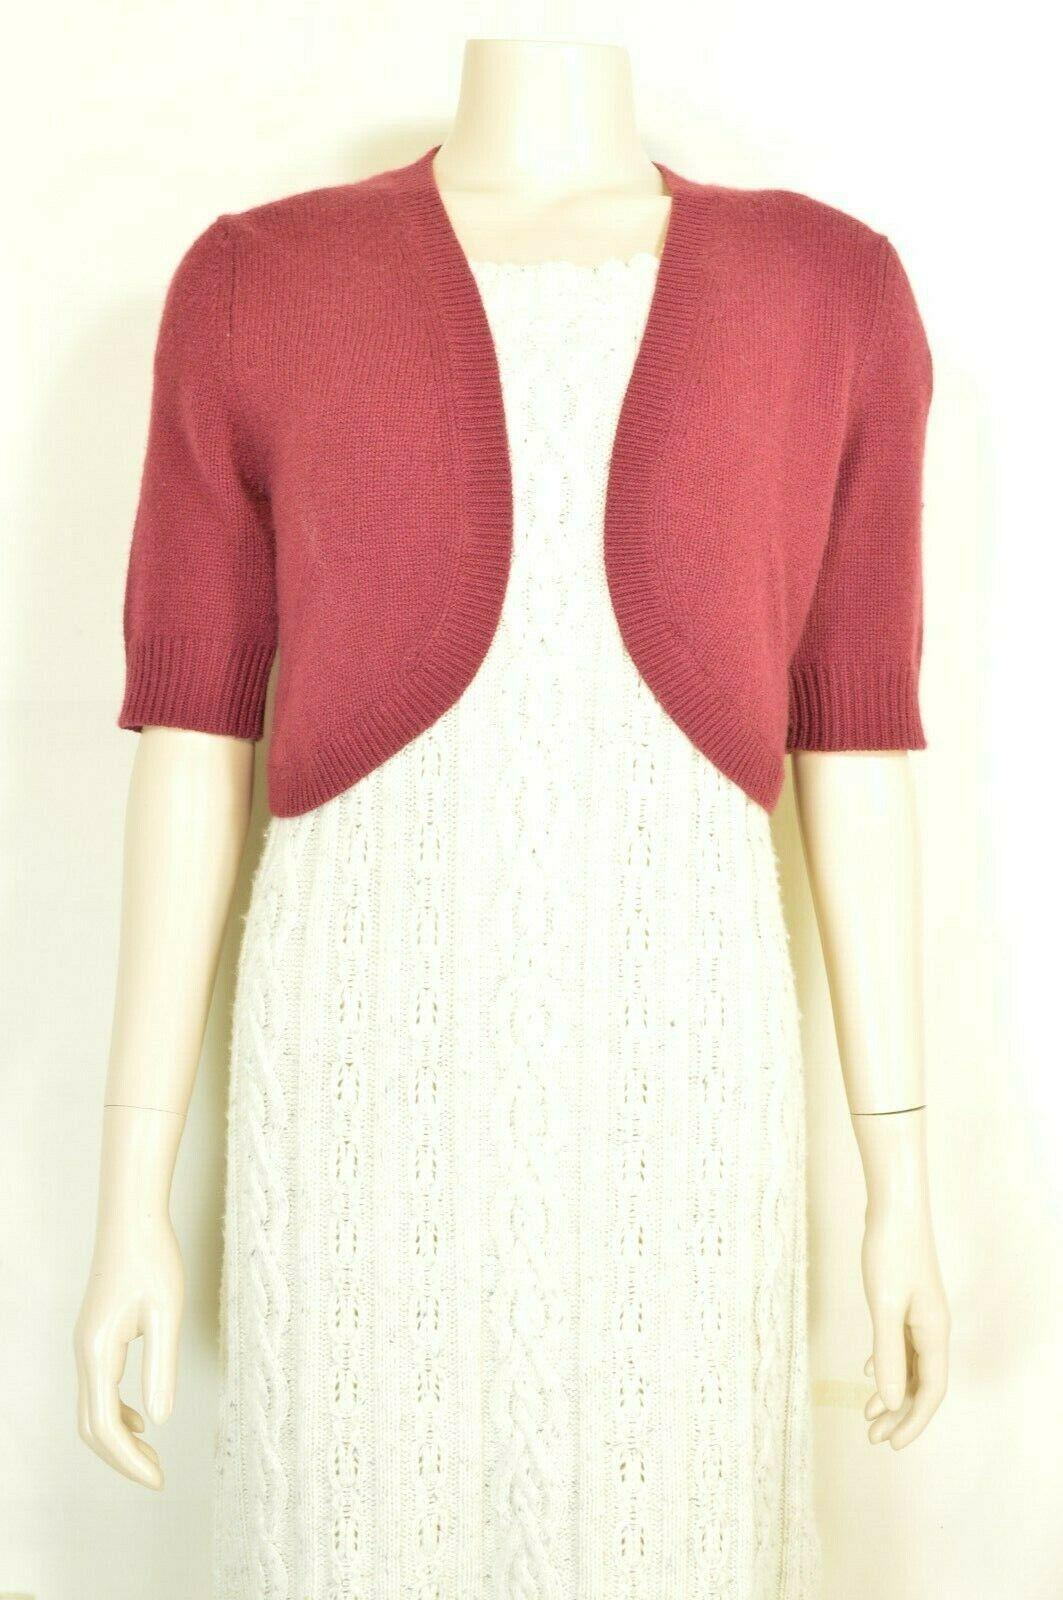 Neiman Marcus sweater M NWT red 100% cashmere shrug bolero cropped $195 new image 10